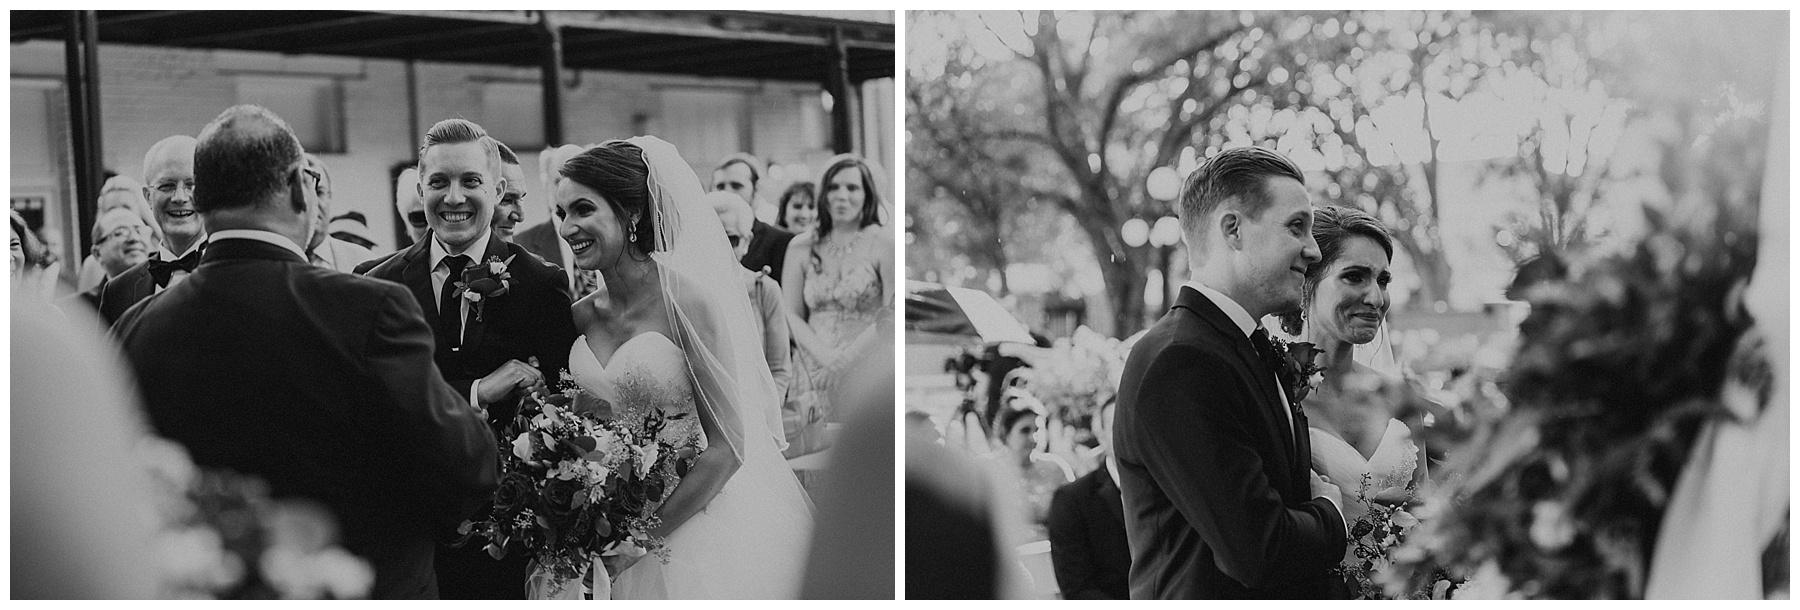 YBOR Wedding Tampa Wedding Photographer-67.jpg